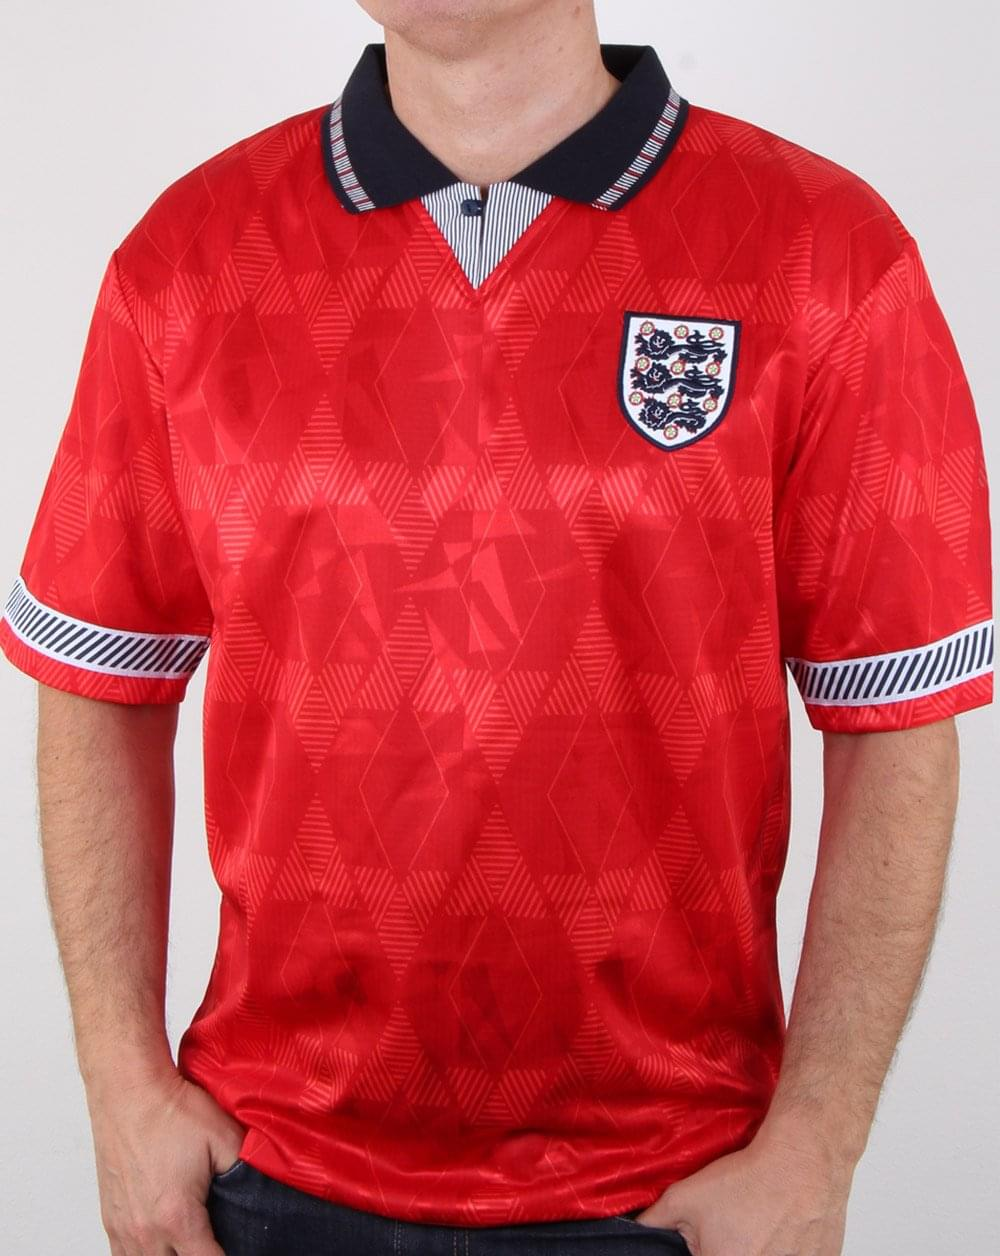 80s Casual Classics 80s Casual Classics England 1990 Away Retro Shirt Red 6f7cd5fb3